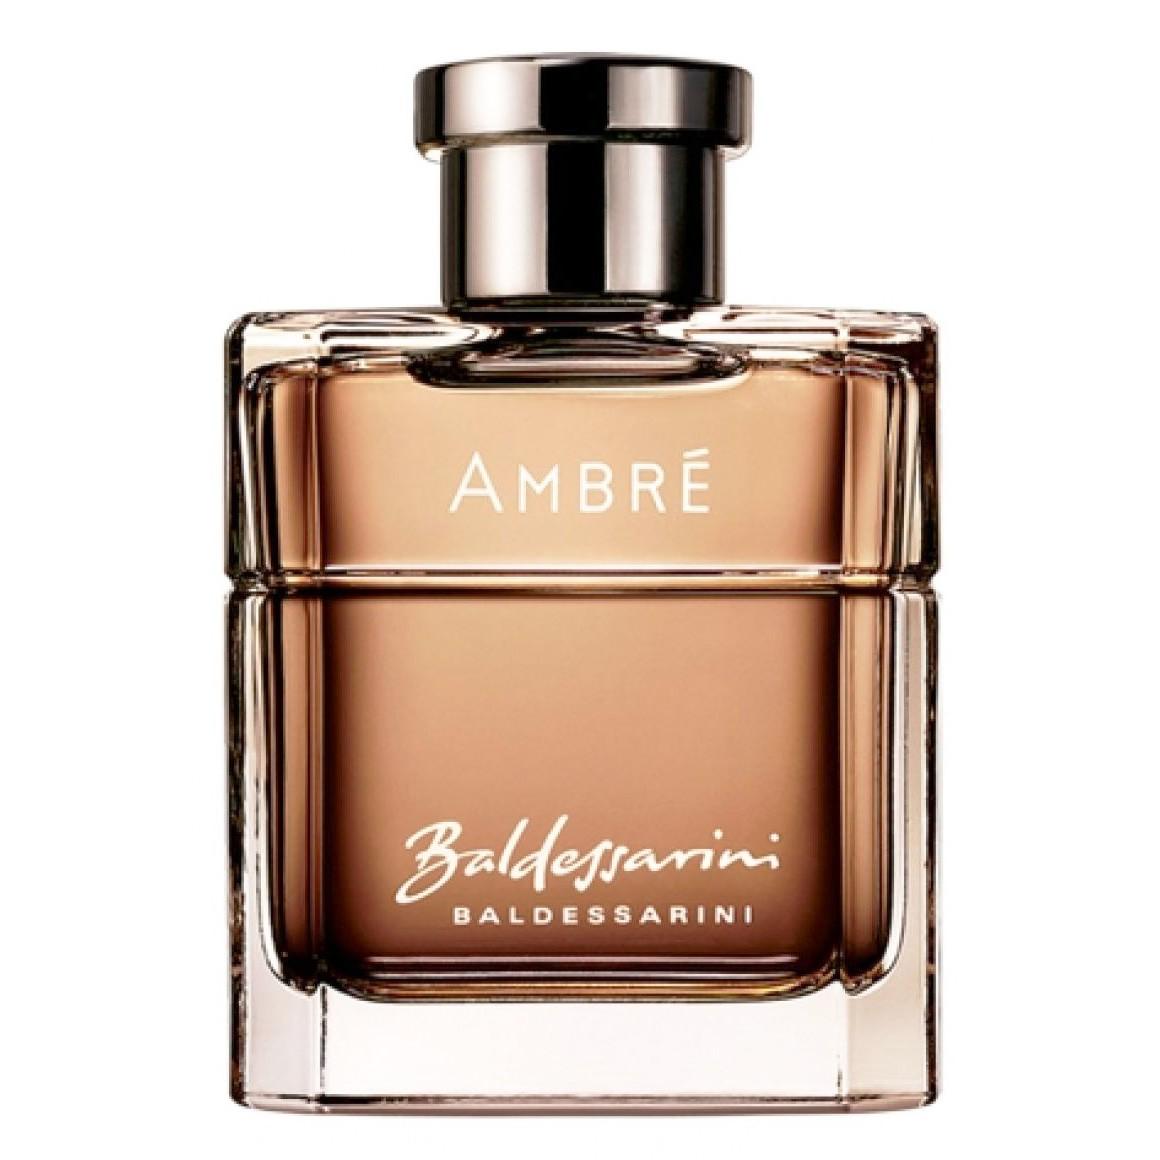 Baldessarini Ambré аромат для мужчин